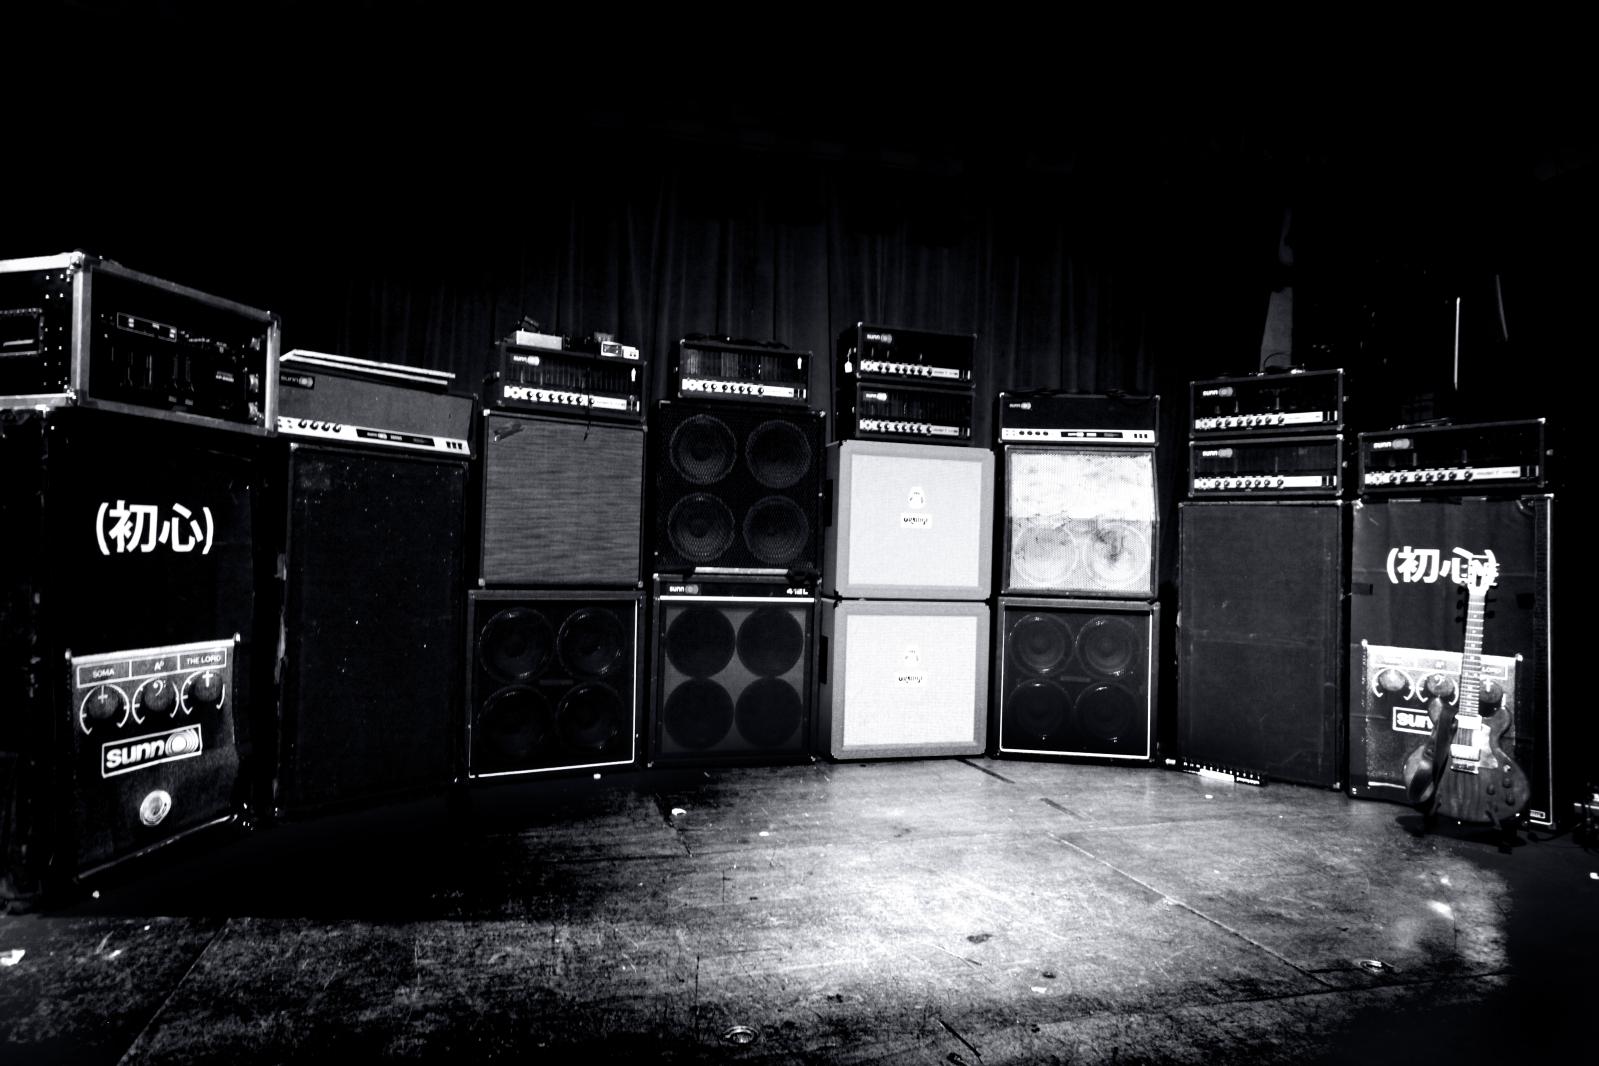 Hd Wallpapers Fender Telecaster 700 X 525 59 Kb Jpeg  HD